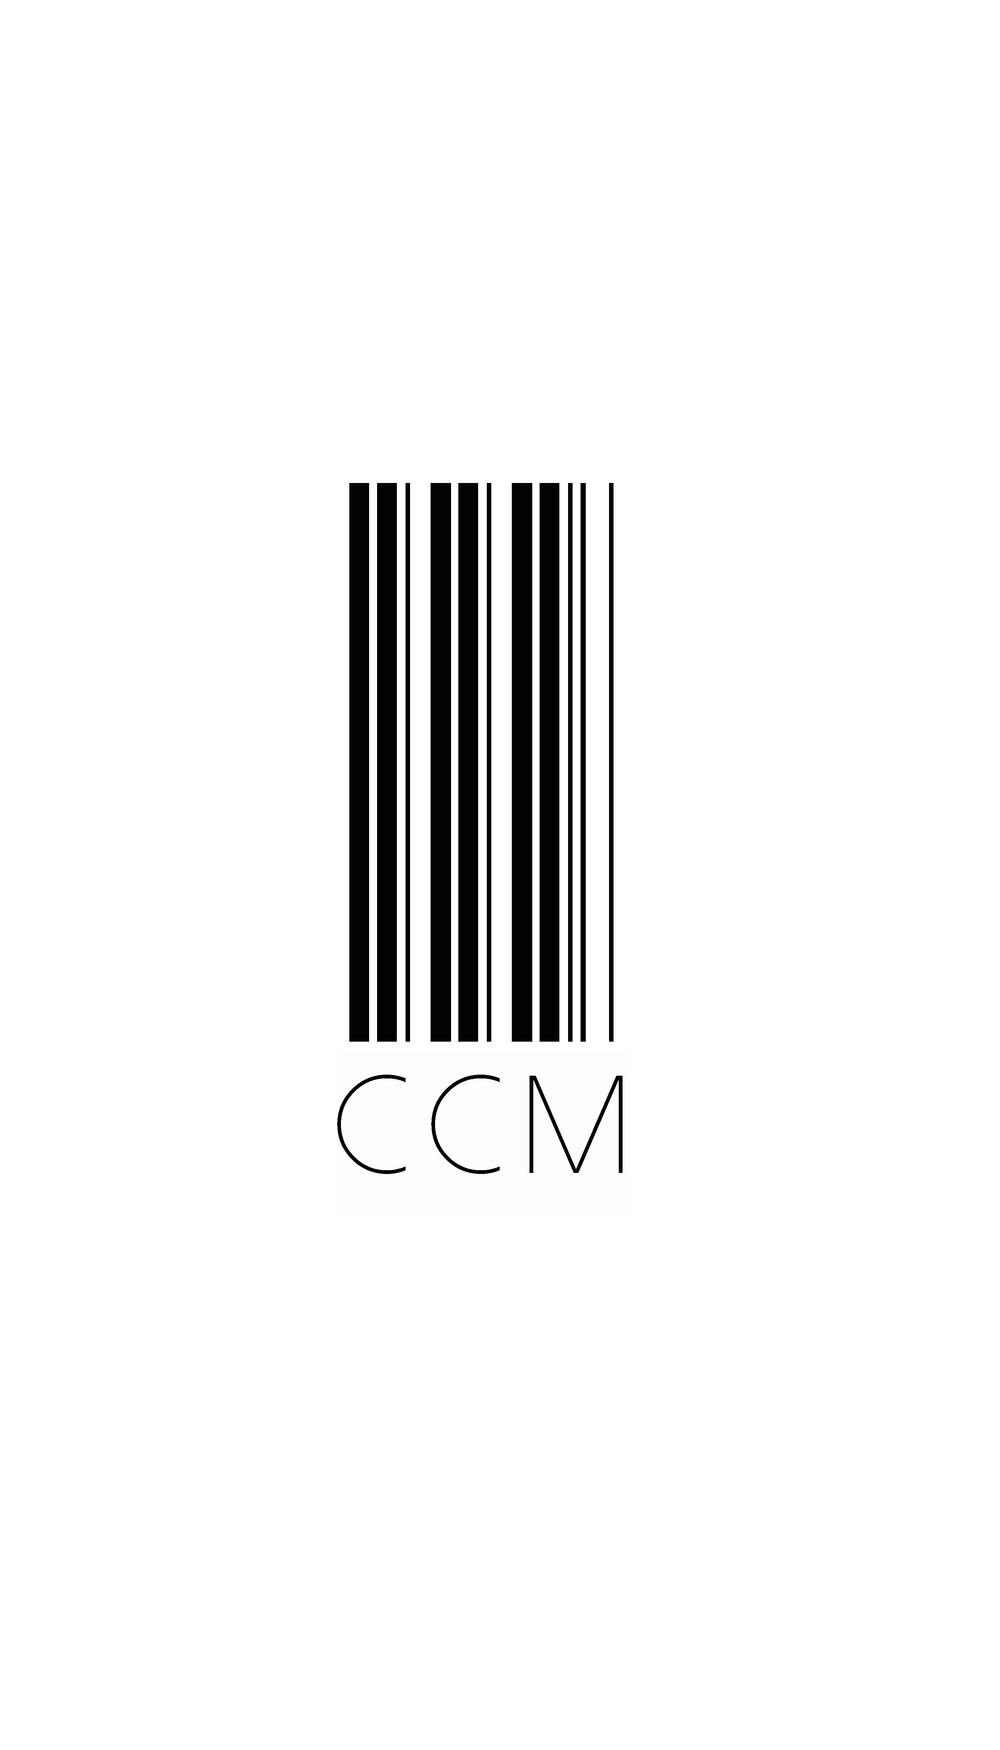 CCMlogo.jpg